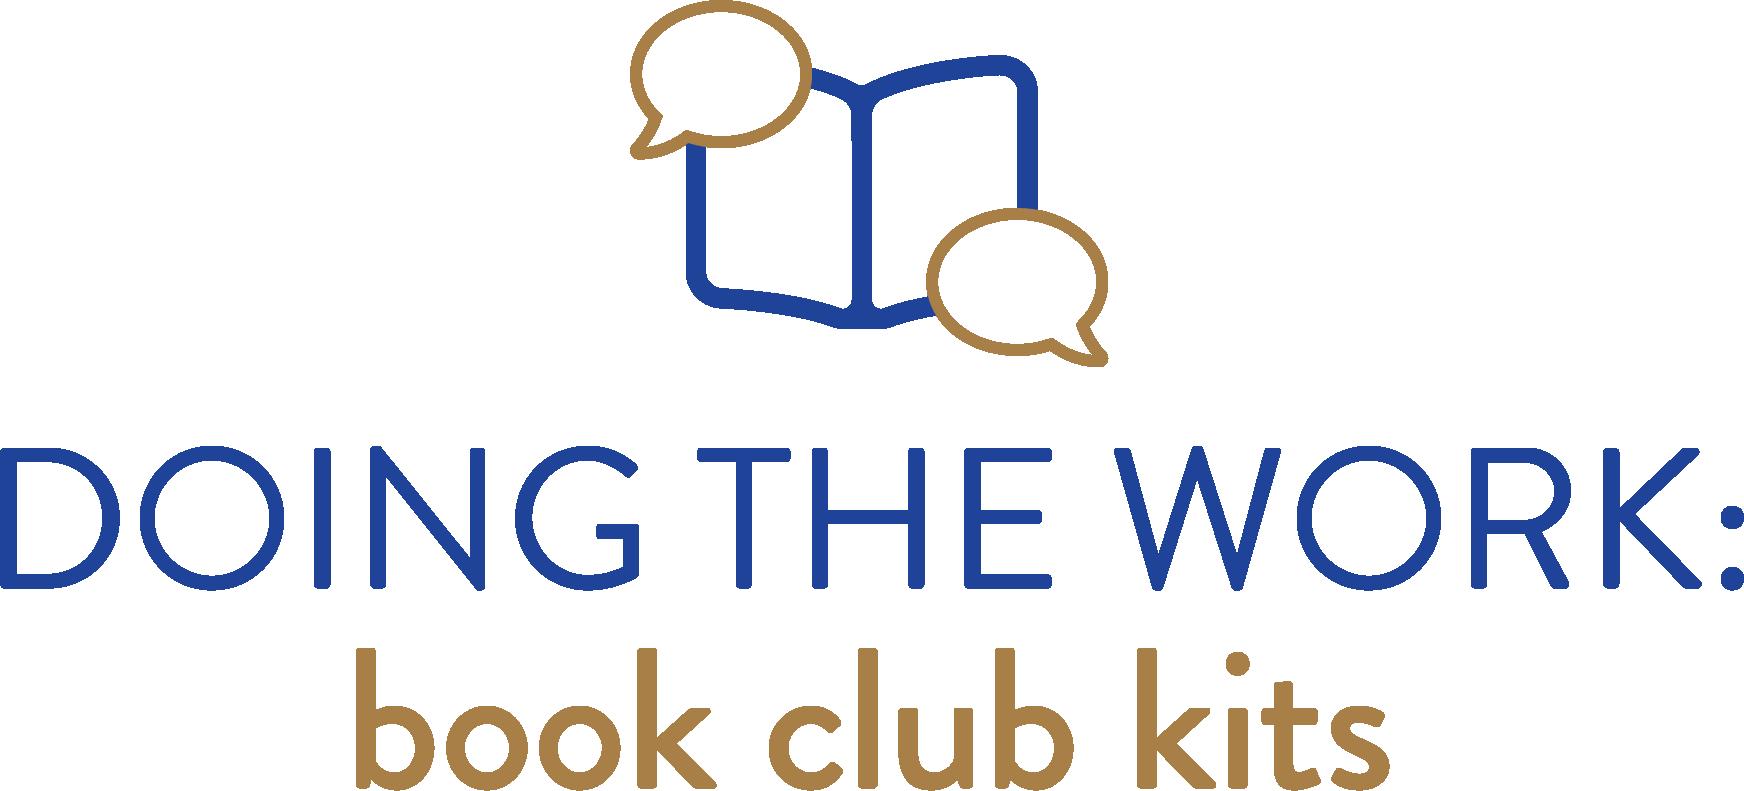 Doing the Work: Book club kits